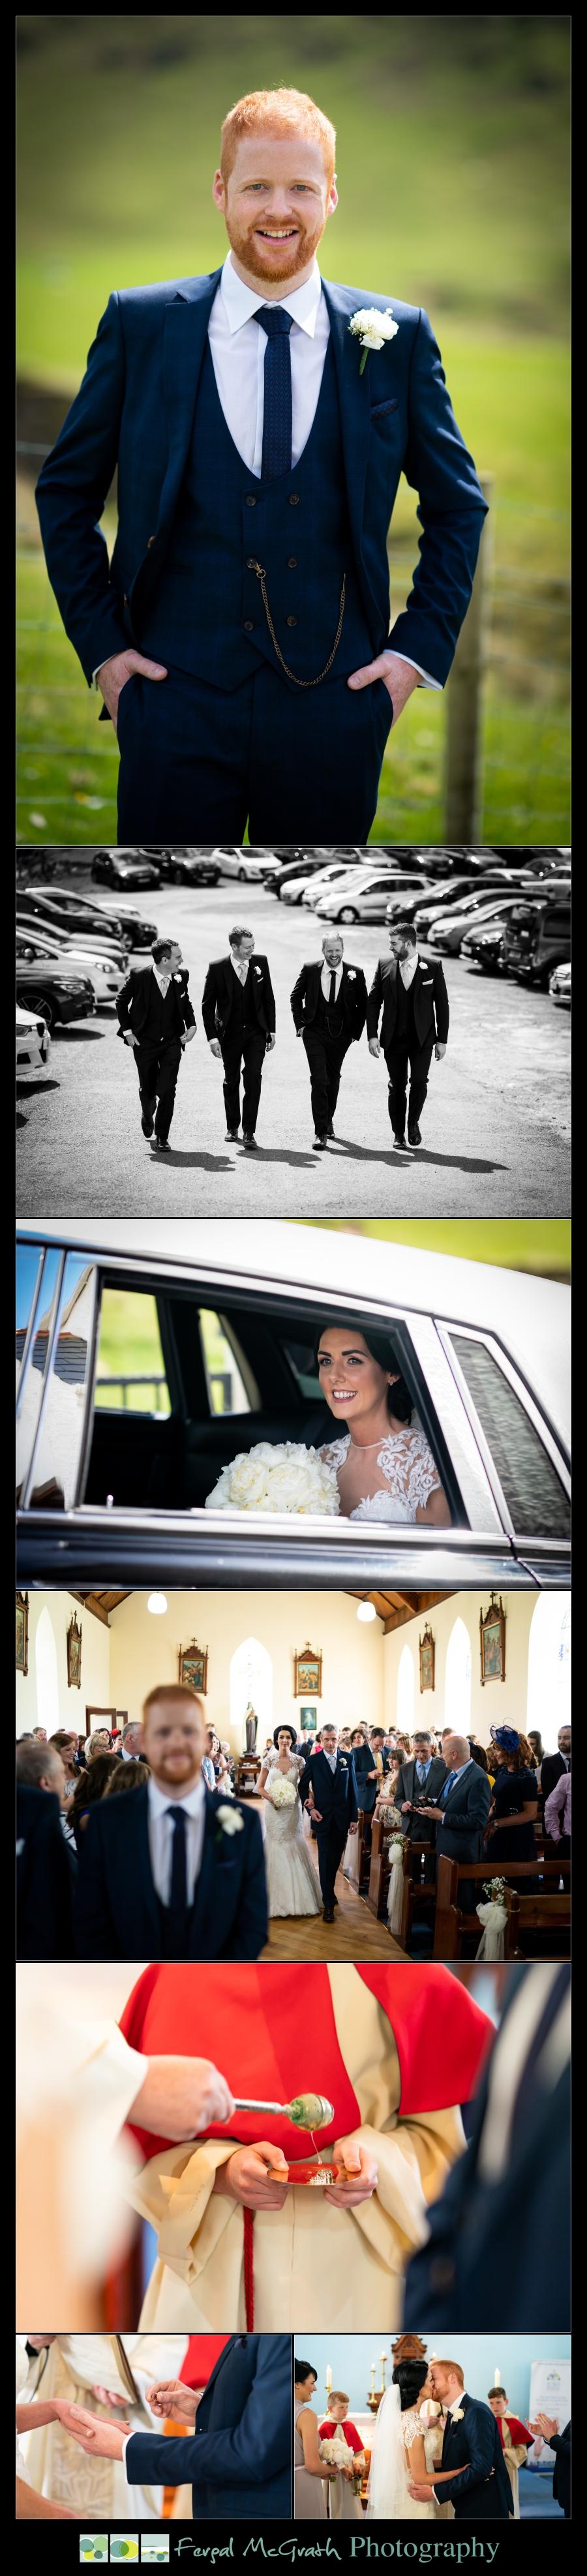 Ballyliffin Lodge Hotel Weddings groom photos